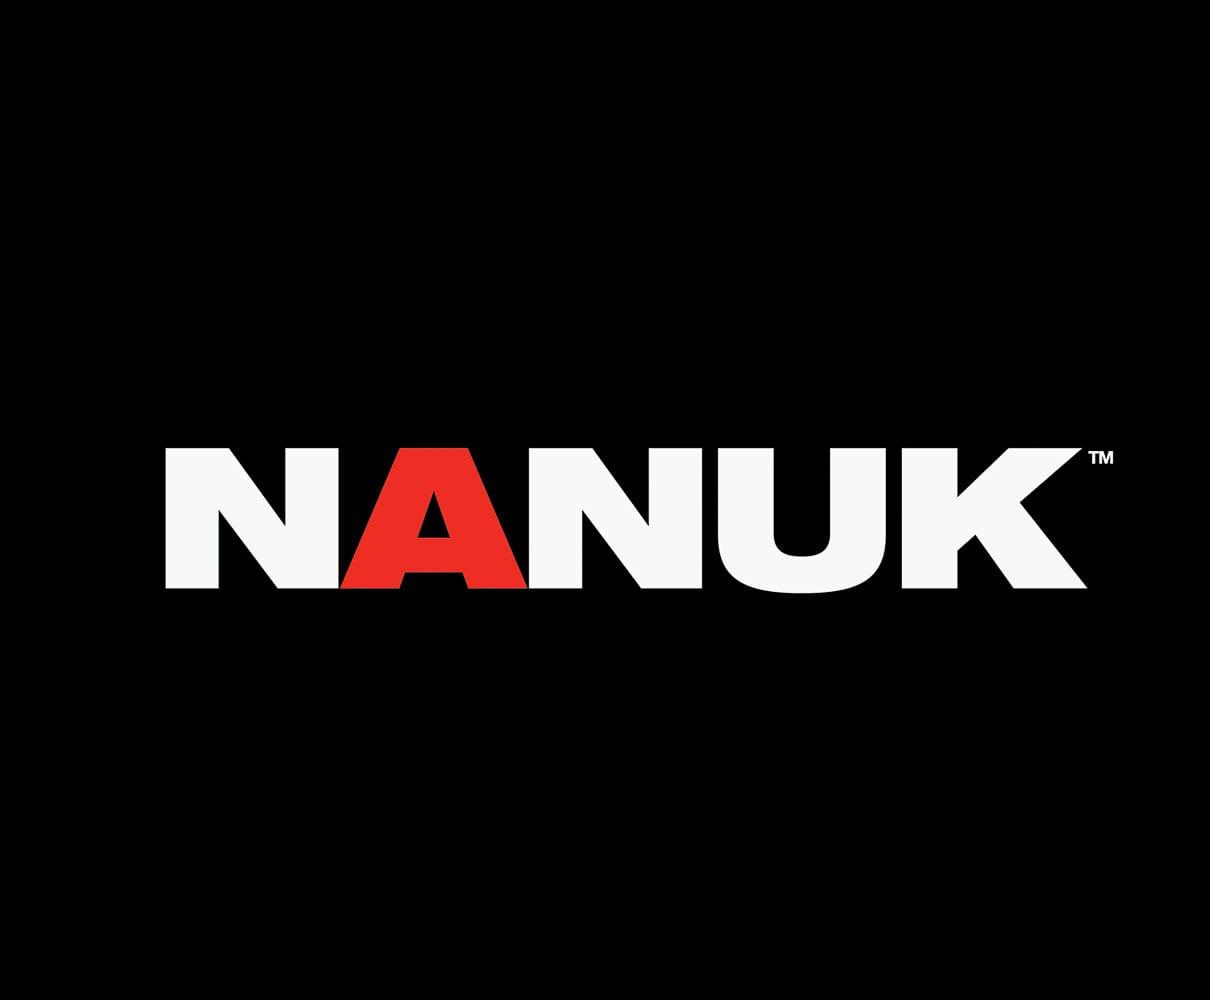 NANUK Cases Protect Your Precious Belongings